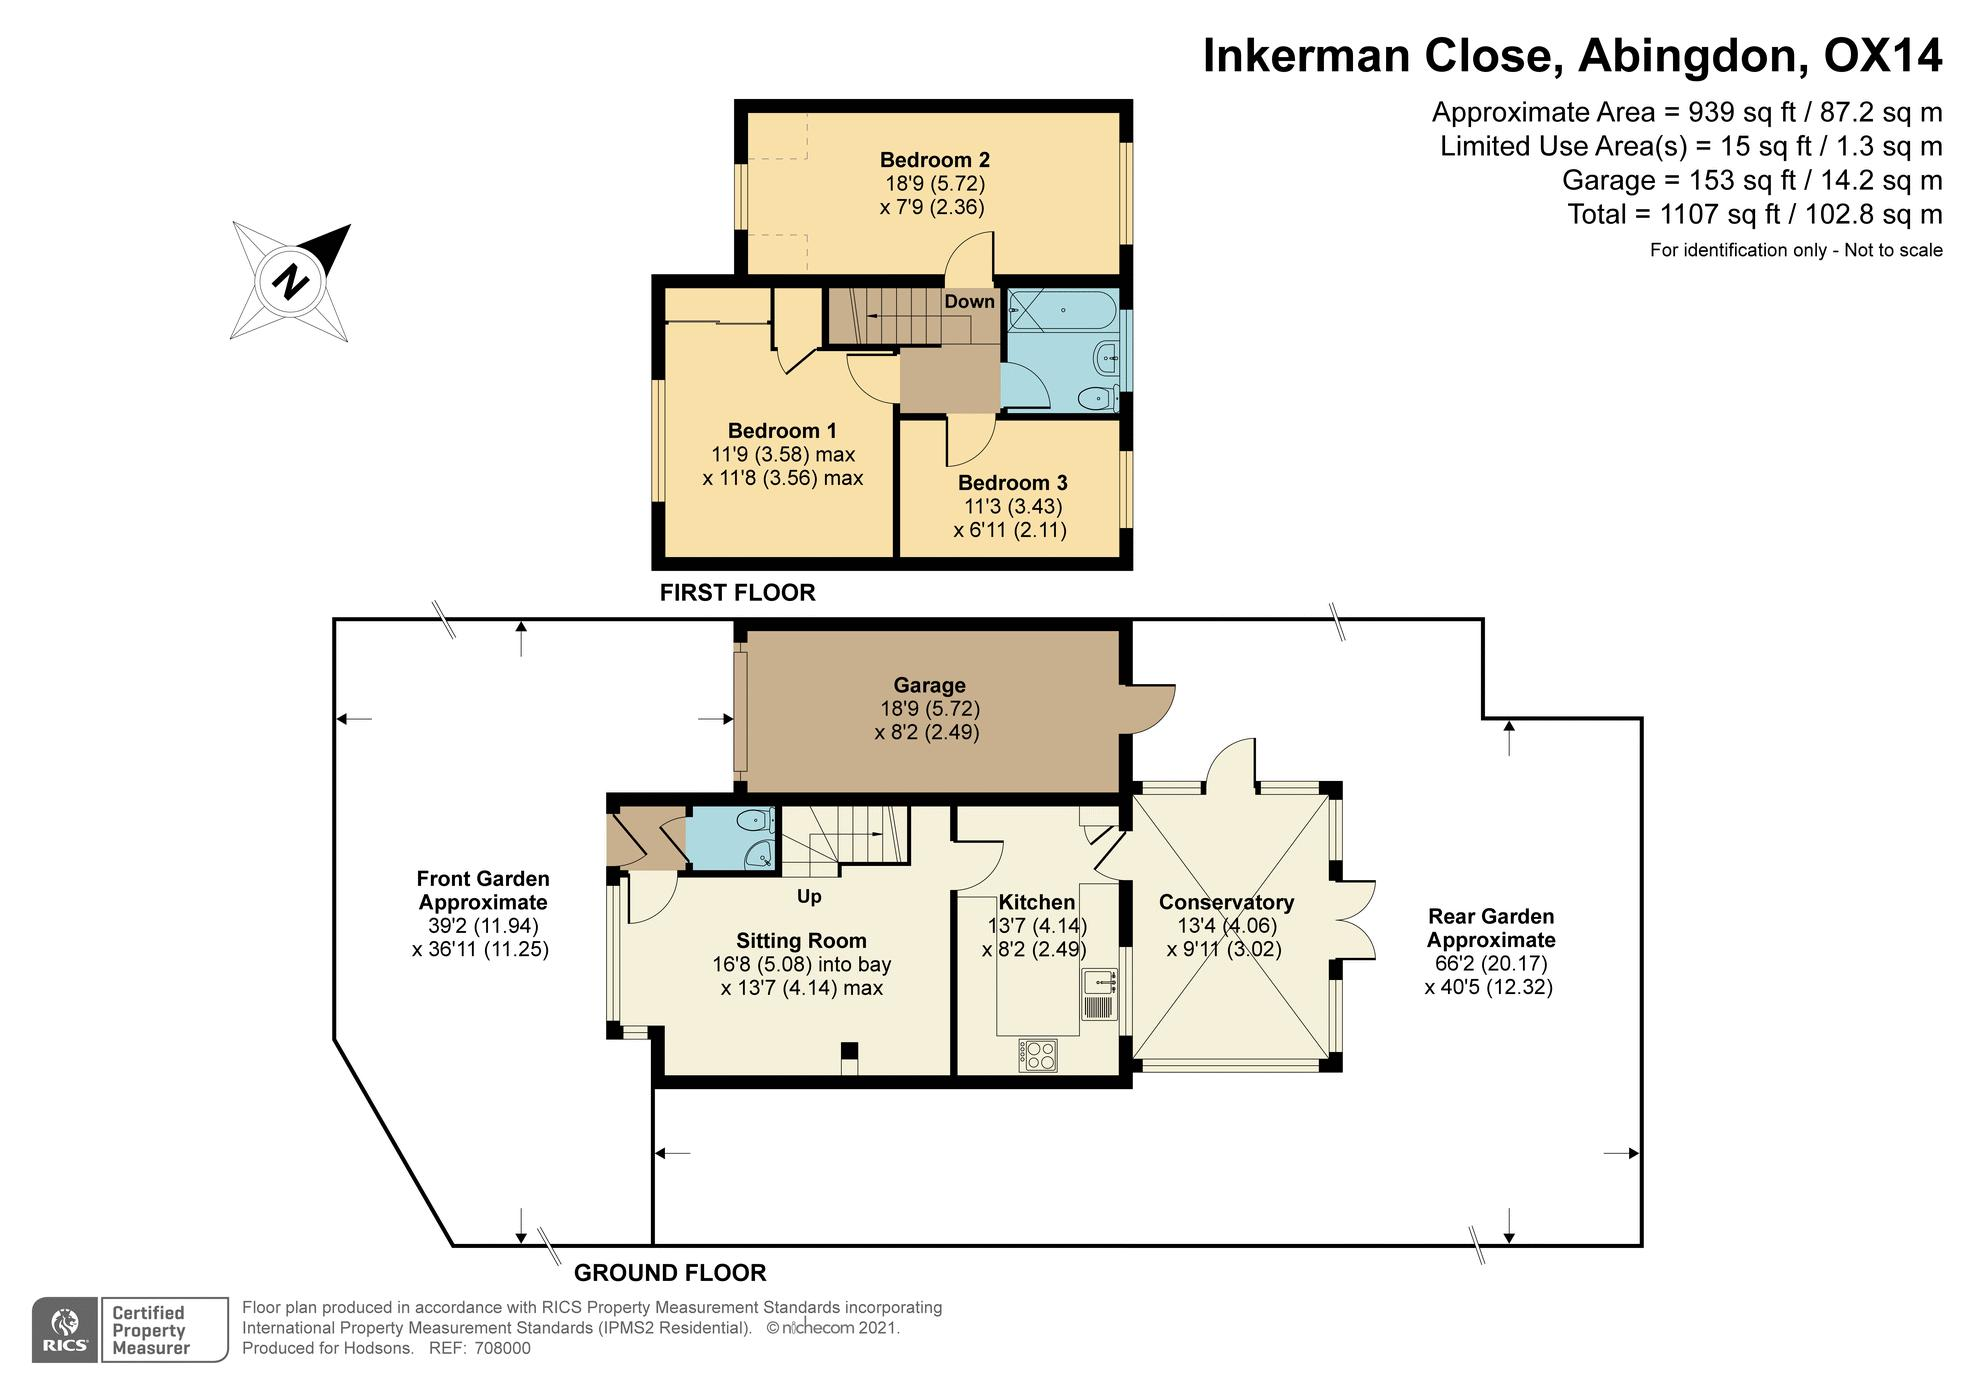 Inkerman Close